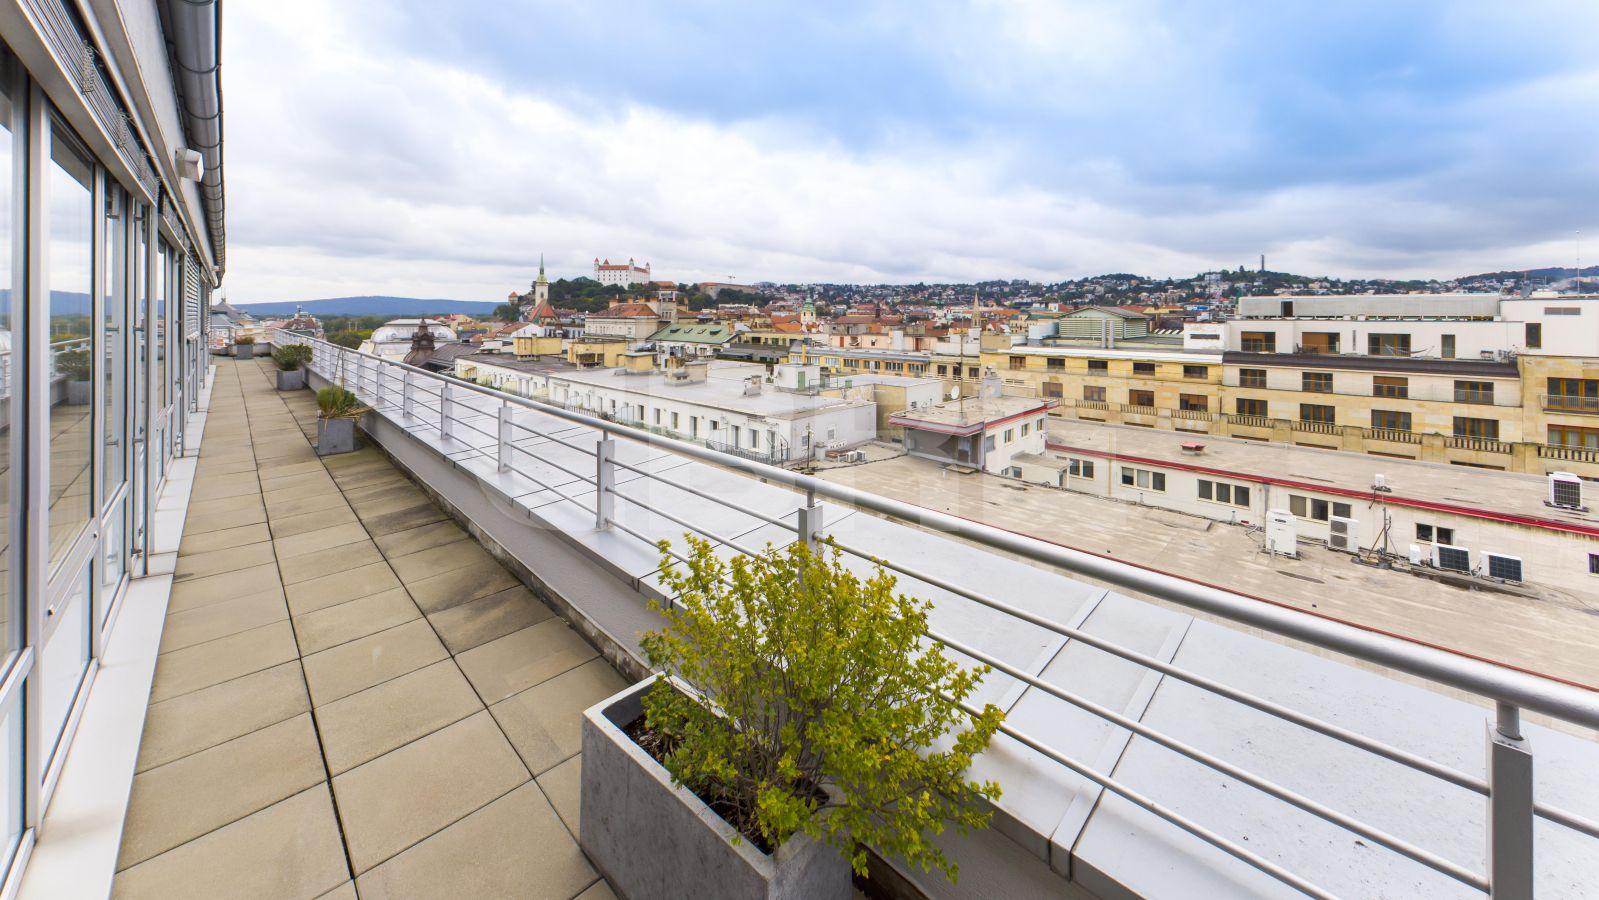 Pressburg Trade Center - Sublease, Bratislava - Staré Mesto | Offices for rent by CBRE | 5